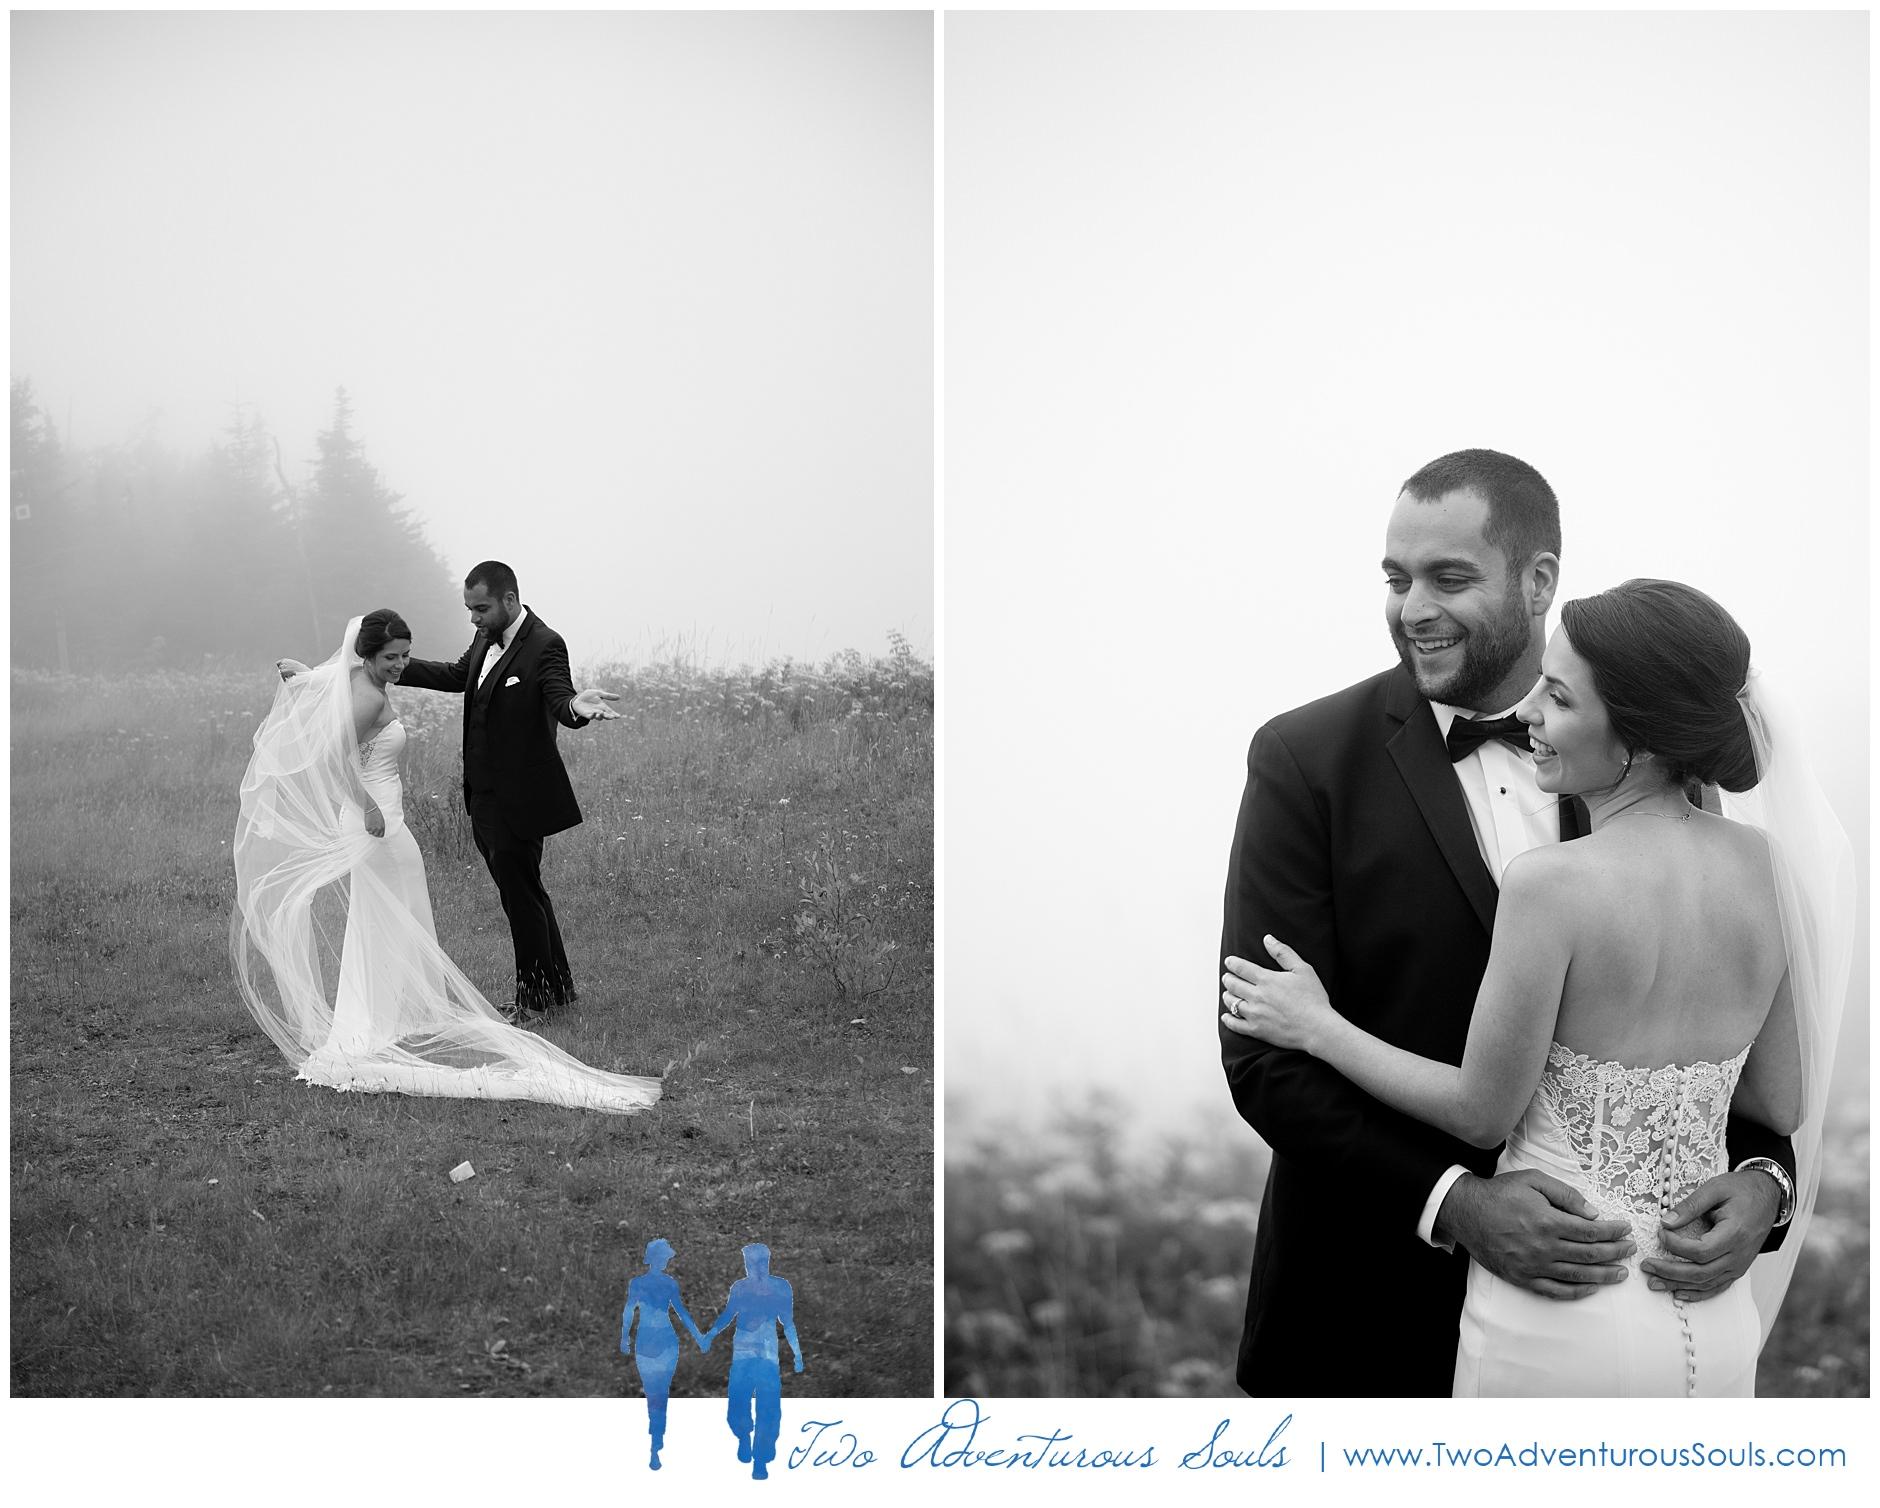 Sugarloaf Outdoor Center Wedding Photographers, Destination Wedding Photographers, Two Adventurous Souls-081719_0021.jpg